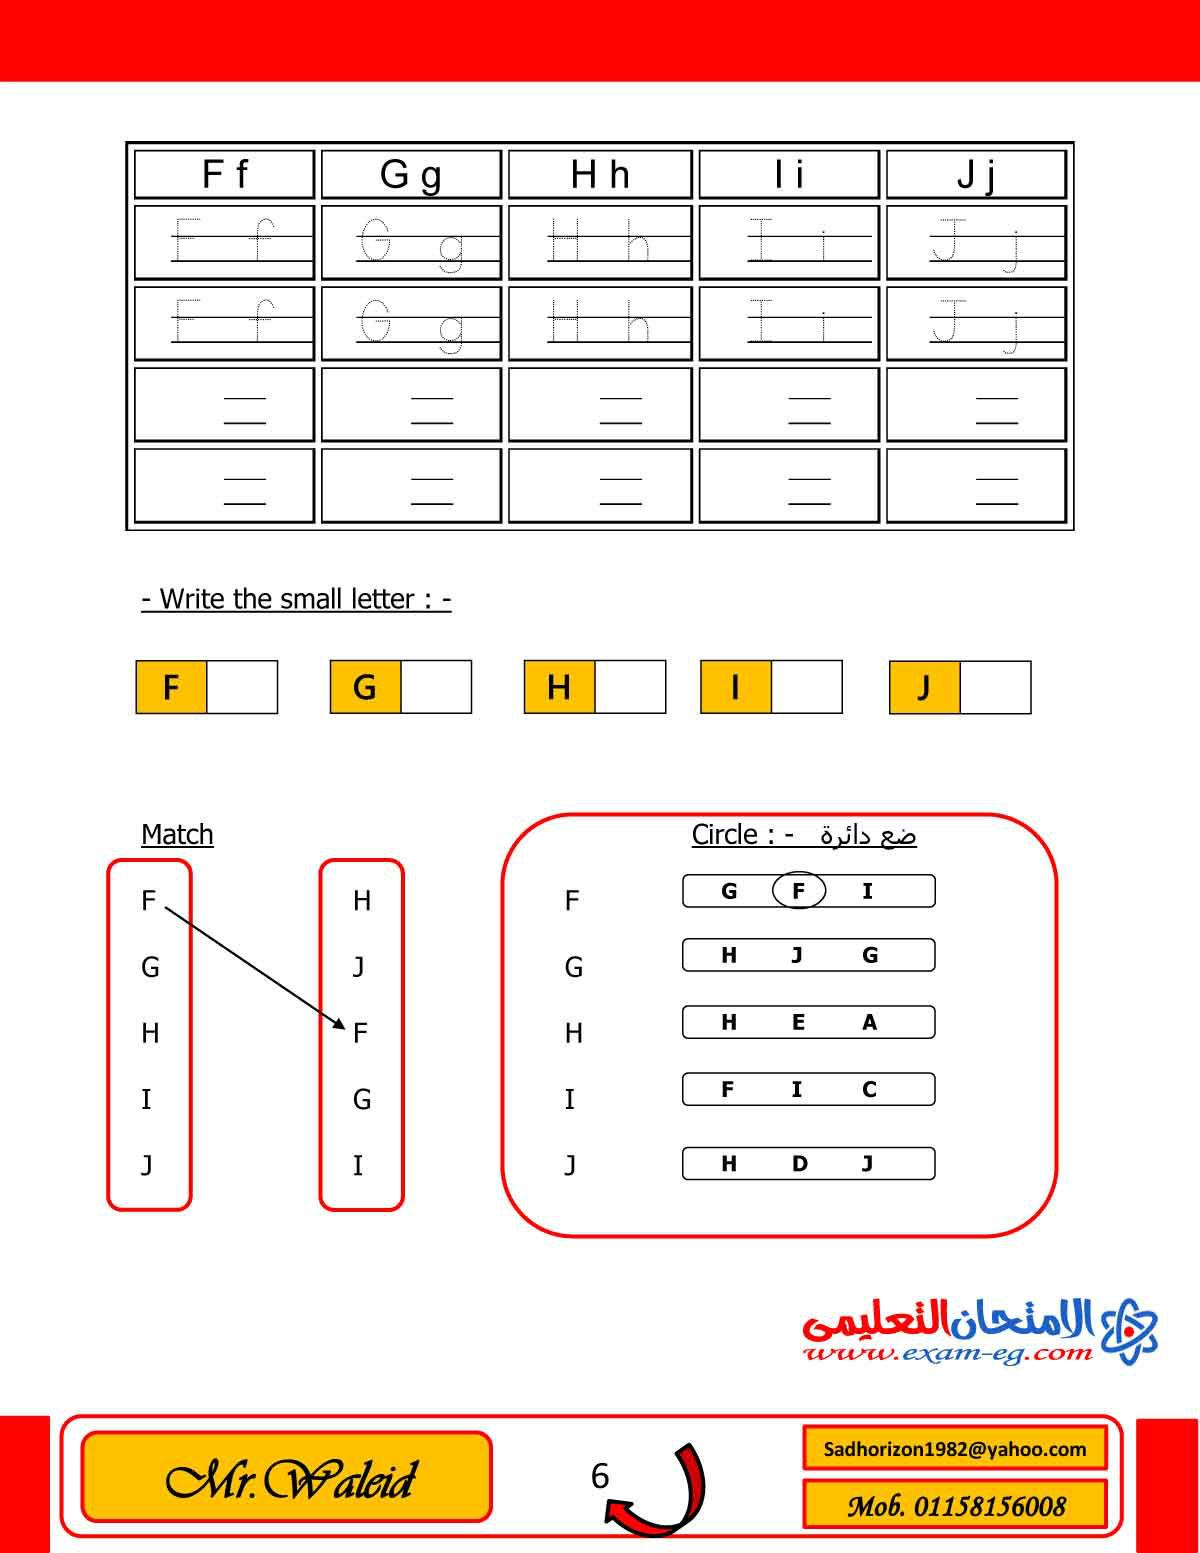 exam-eg.com_144940524336.jpg